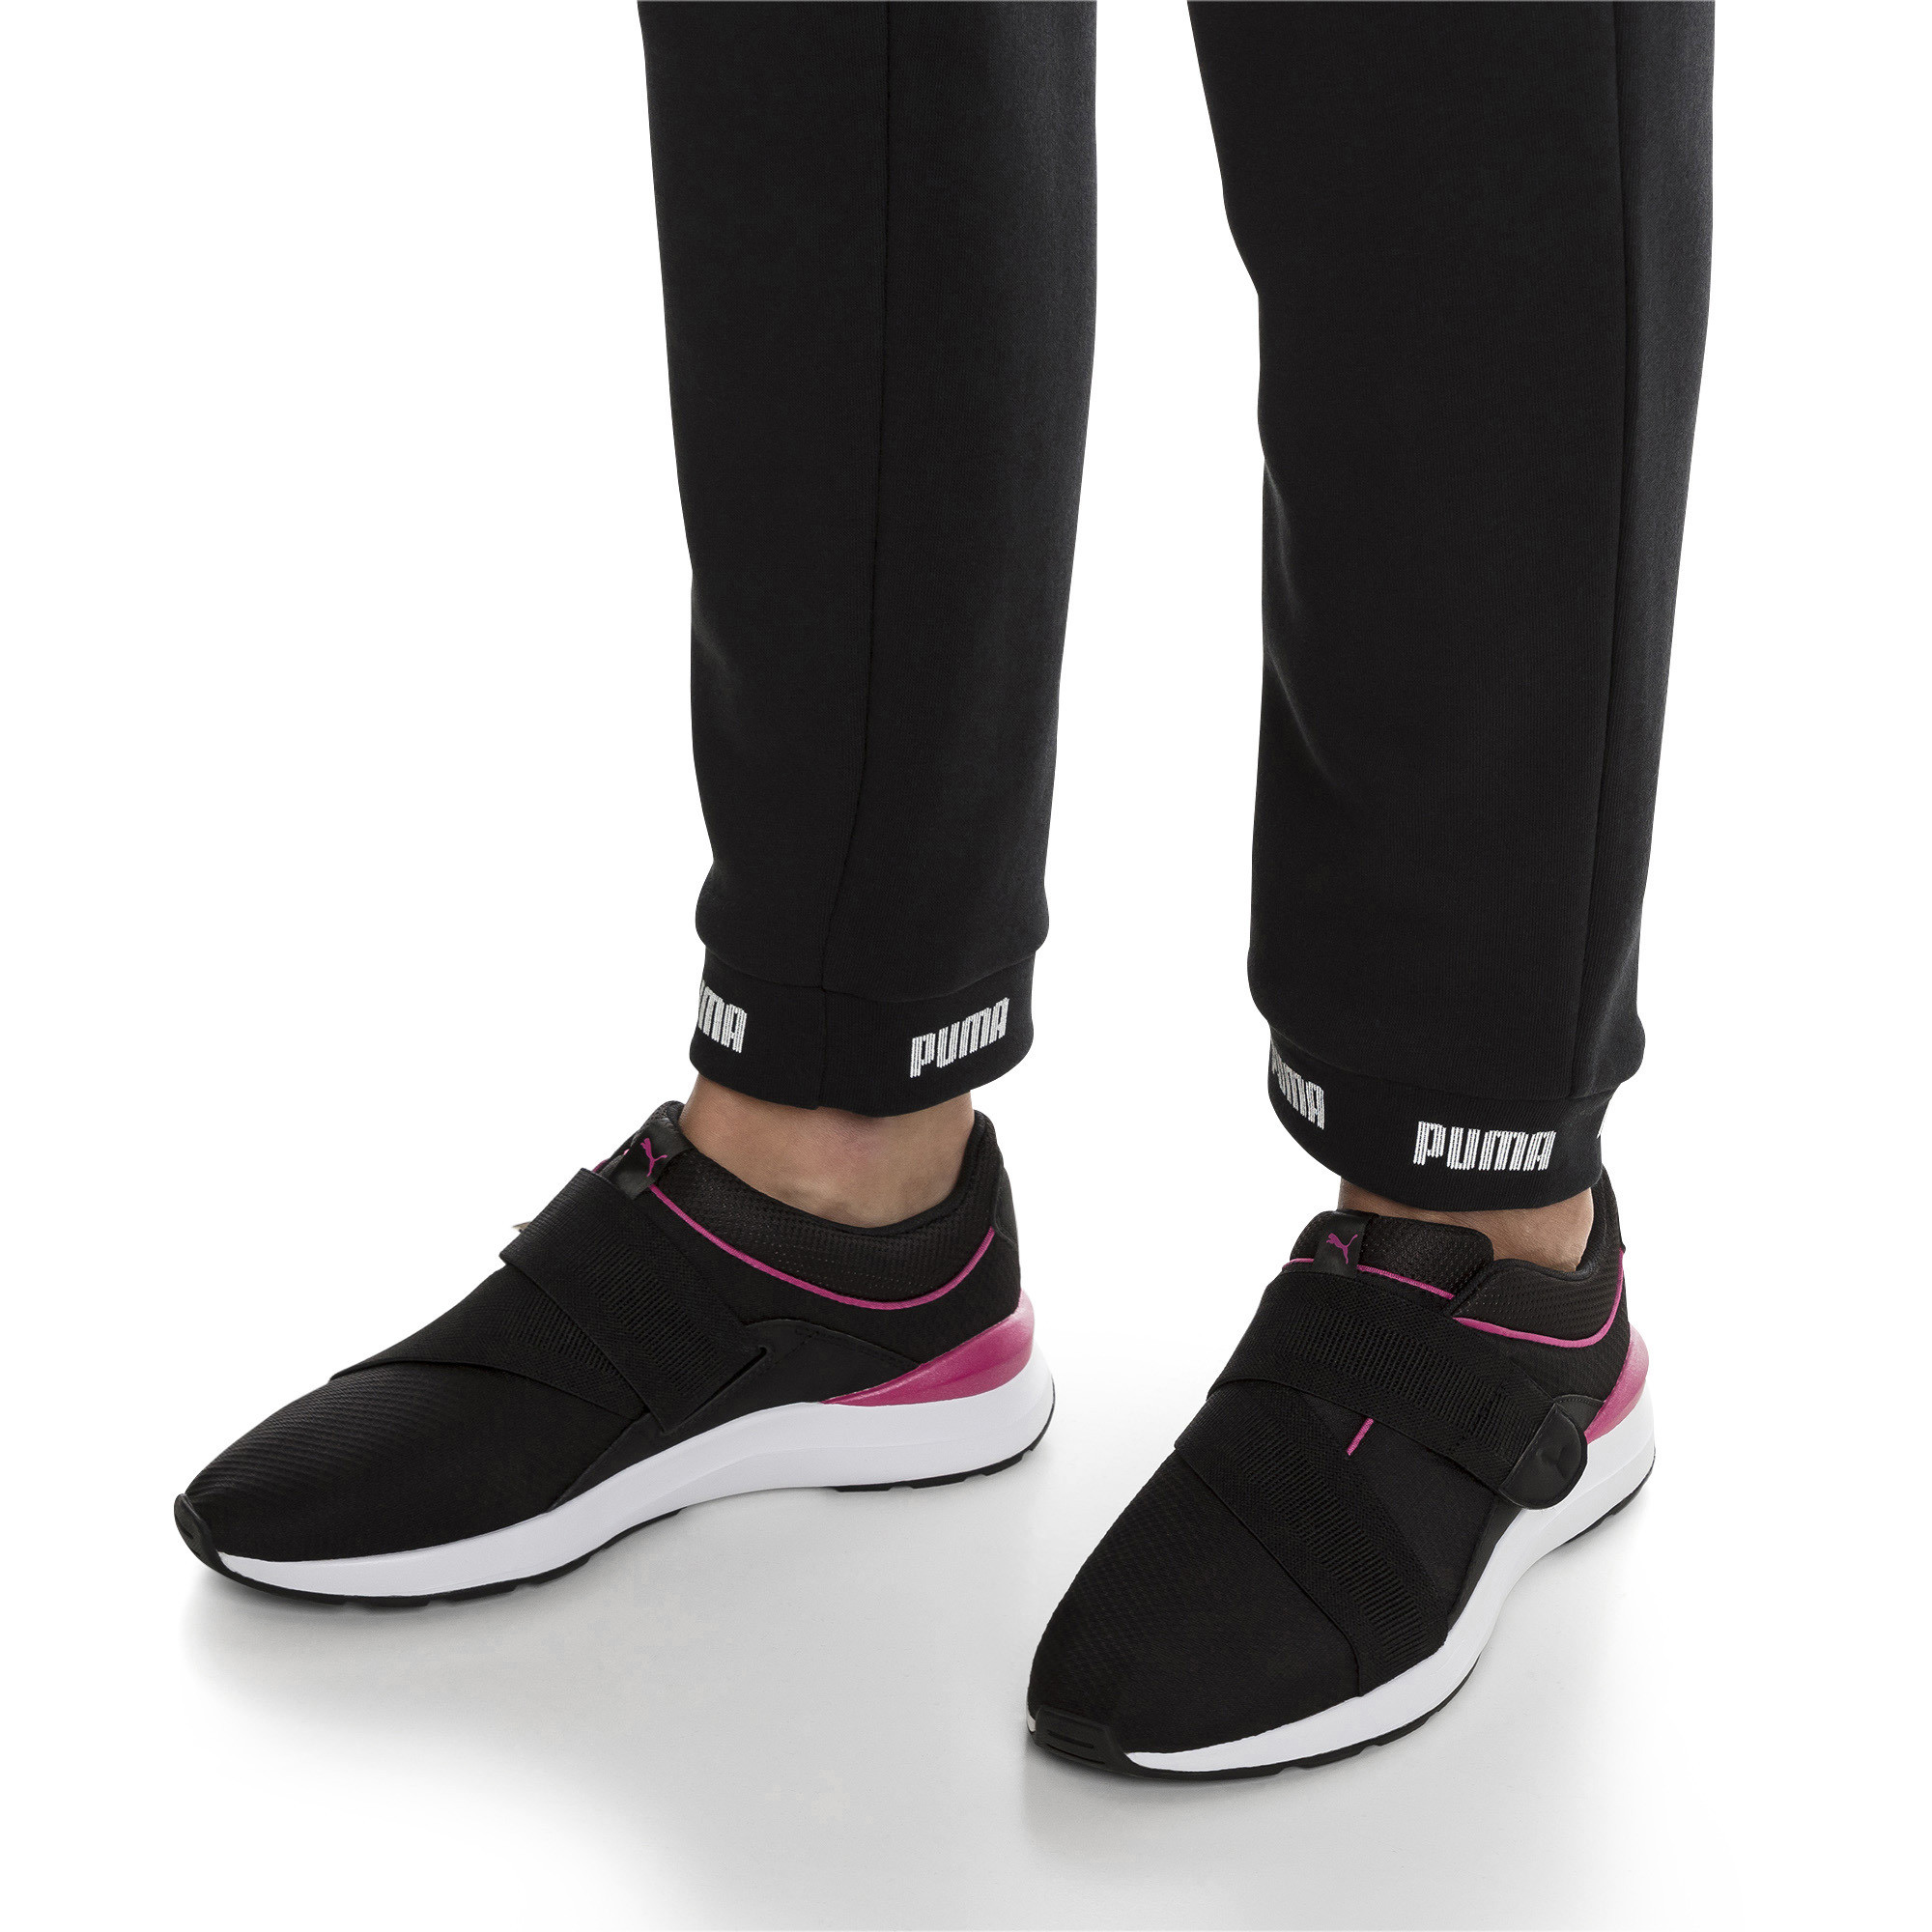 PUMA-Adela-X-Women-s-Sneakers-Women-Shoe-Basics thumbnail 13